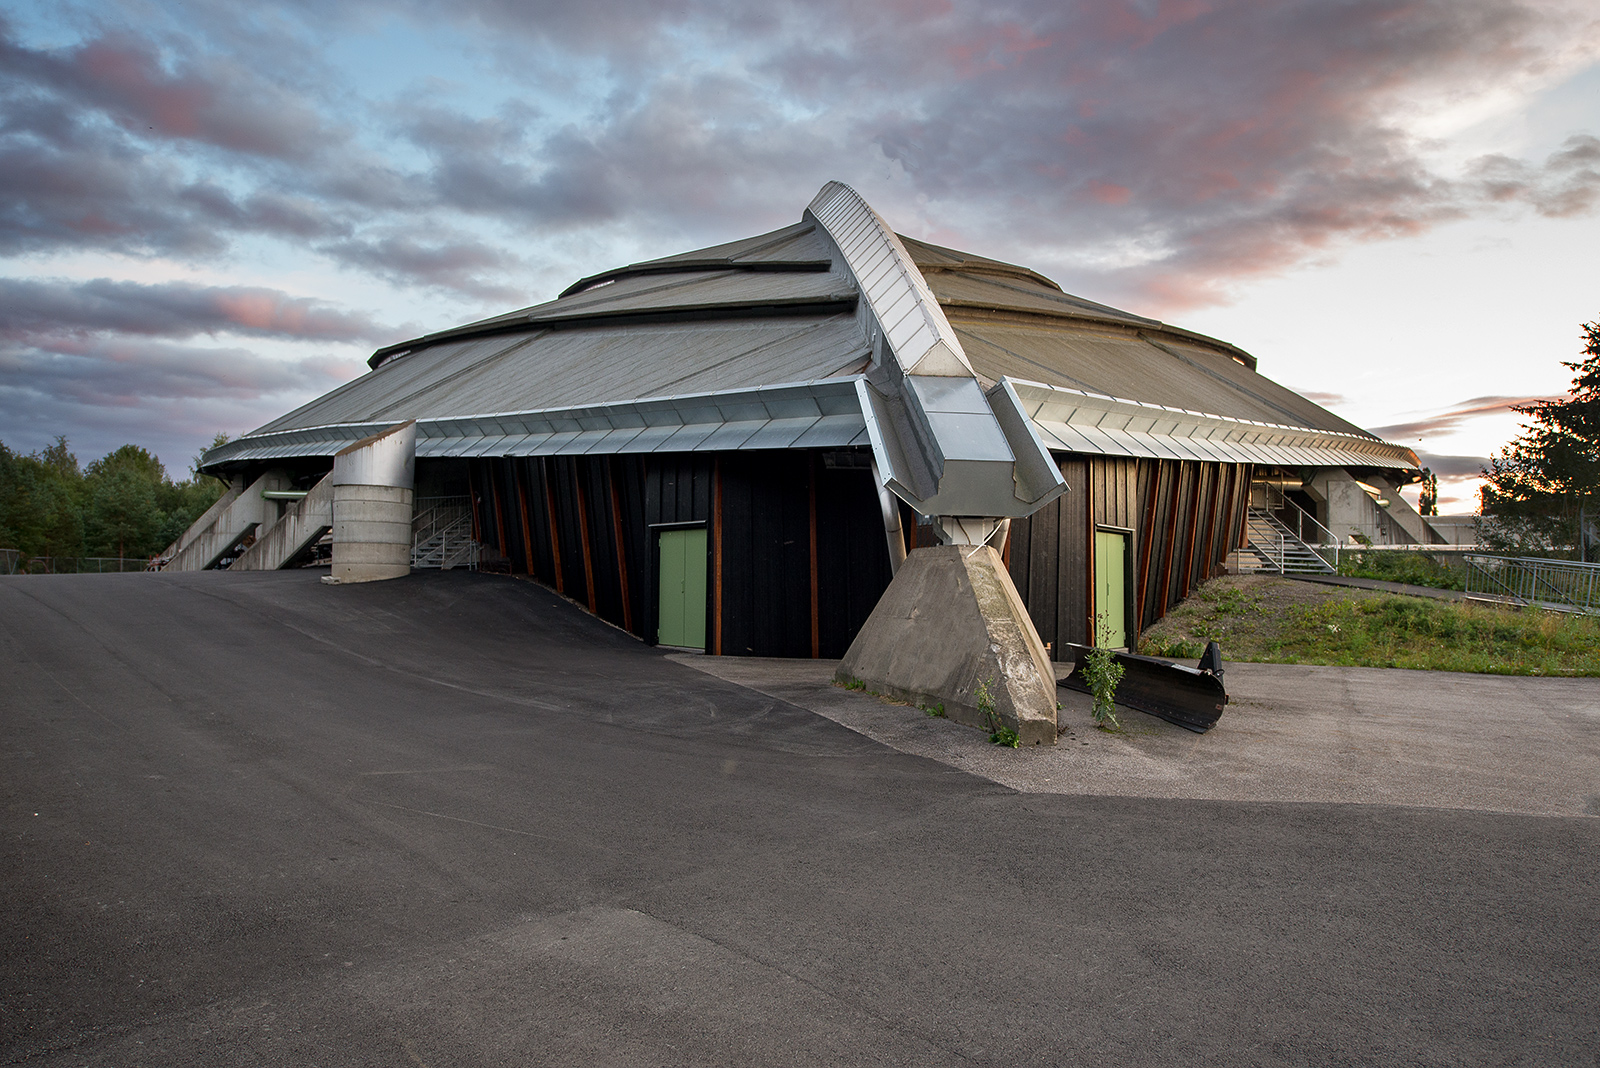 Olympijská hala v Hamaru, Norsko